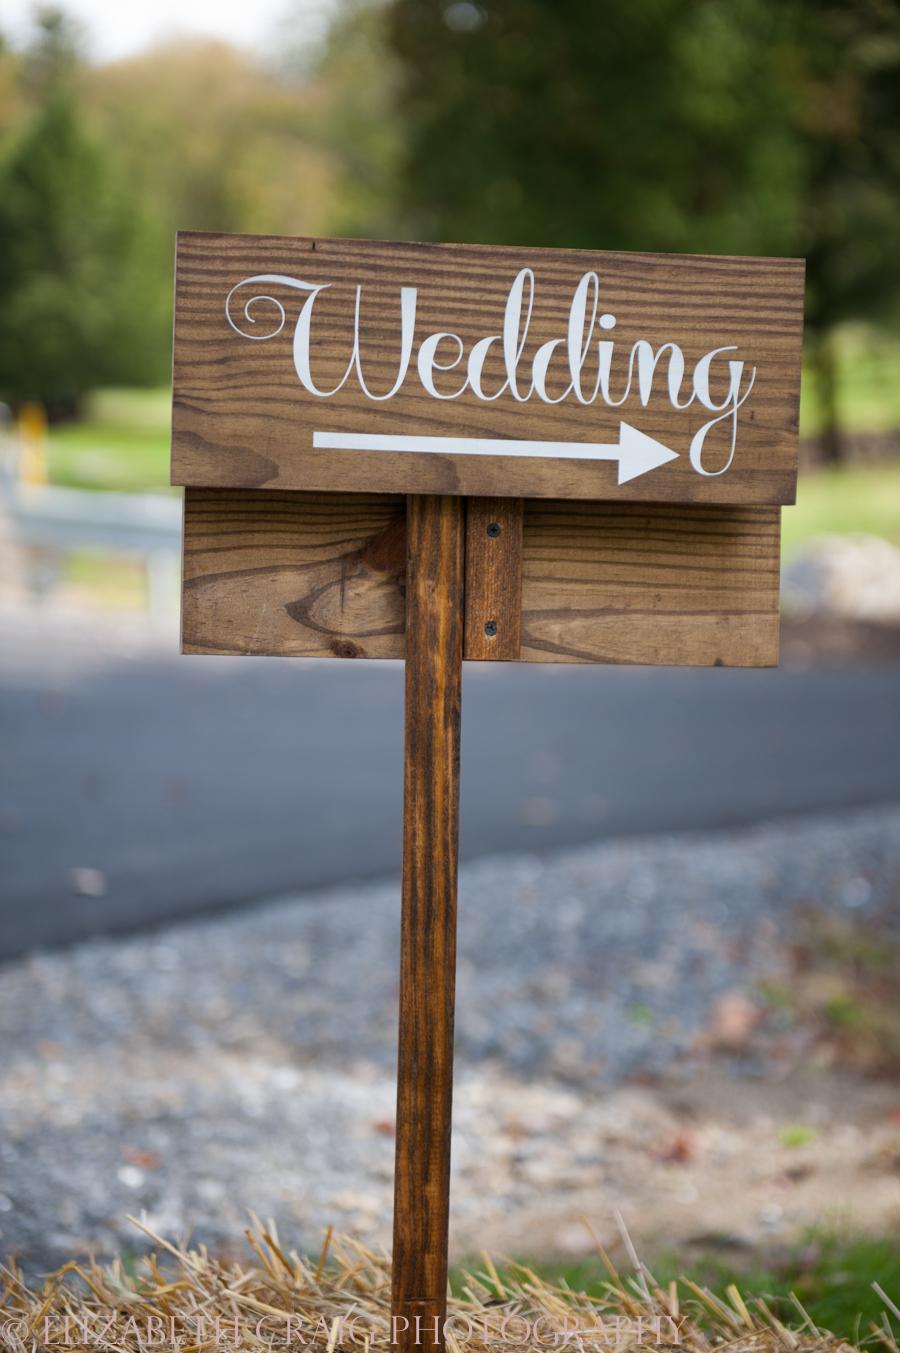 Dubois Brockway St. Marys PA Weddings-0002